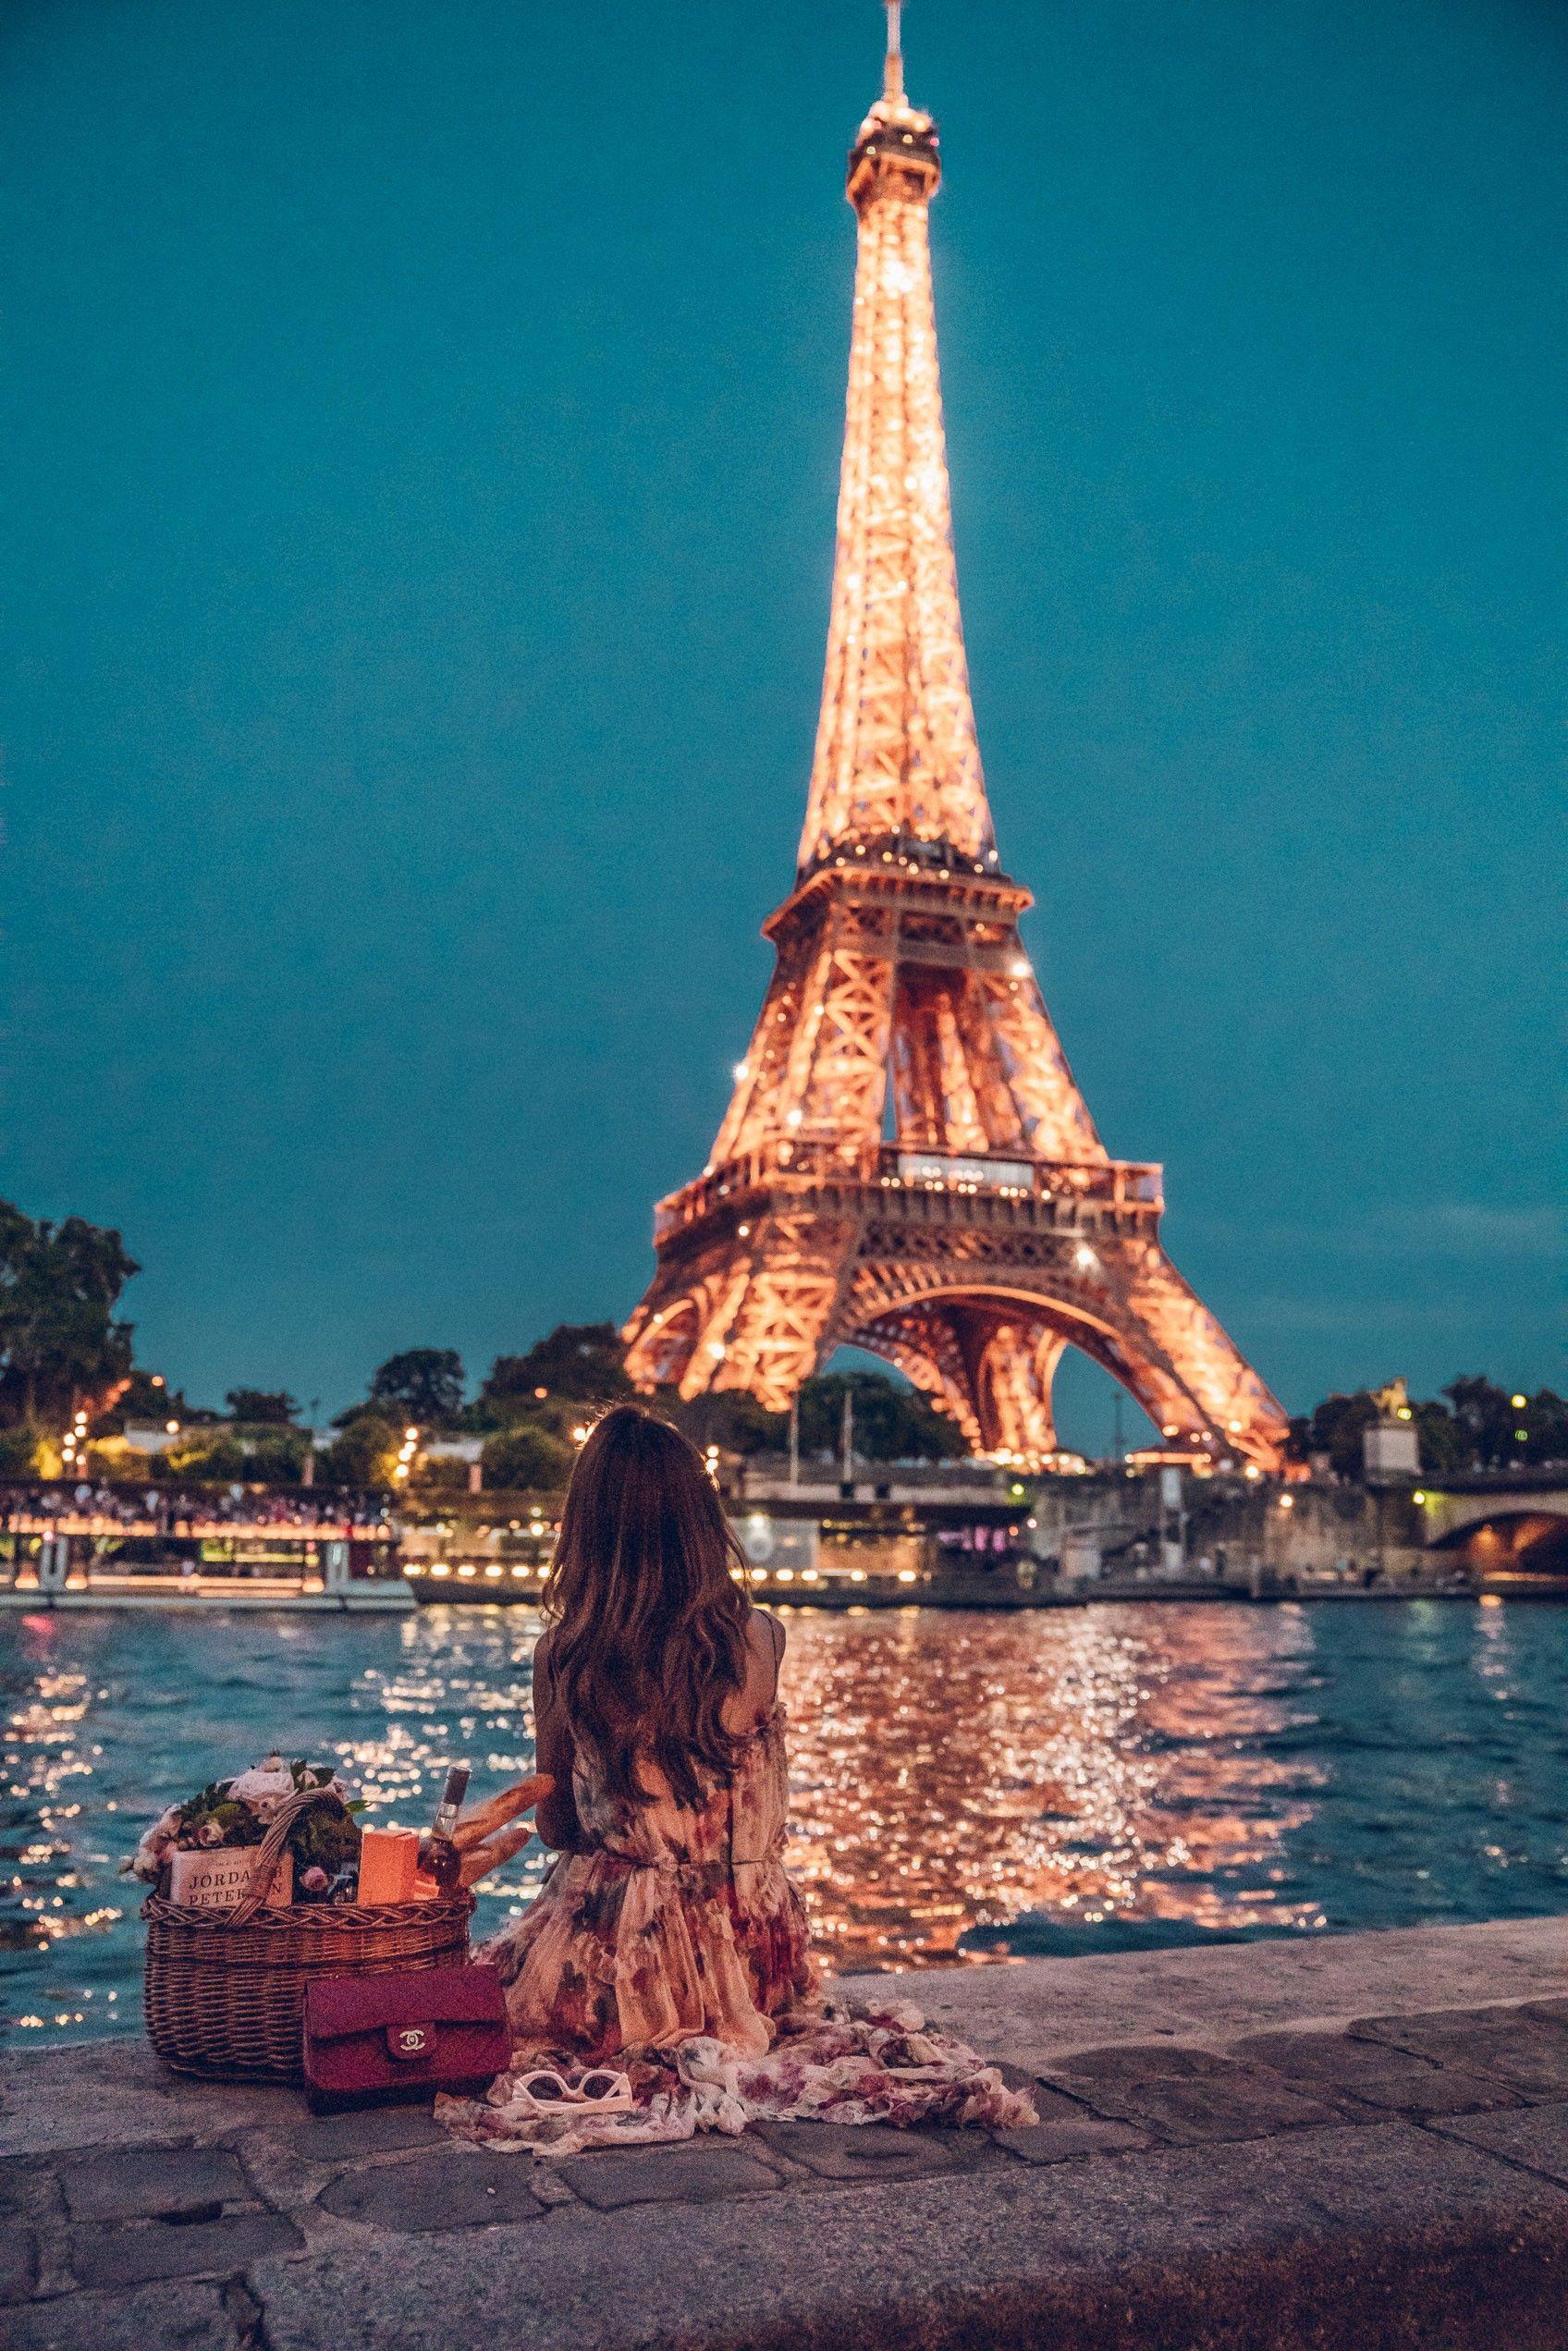 Picnic At Eiffel Tower Vivaluxury Paris At Night Paris Photography Paris Pictures